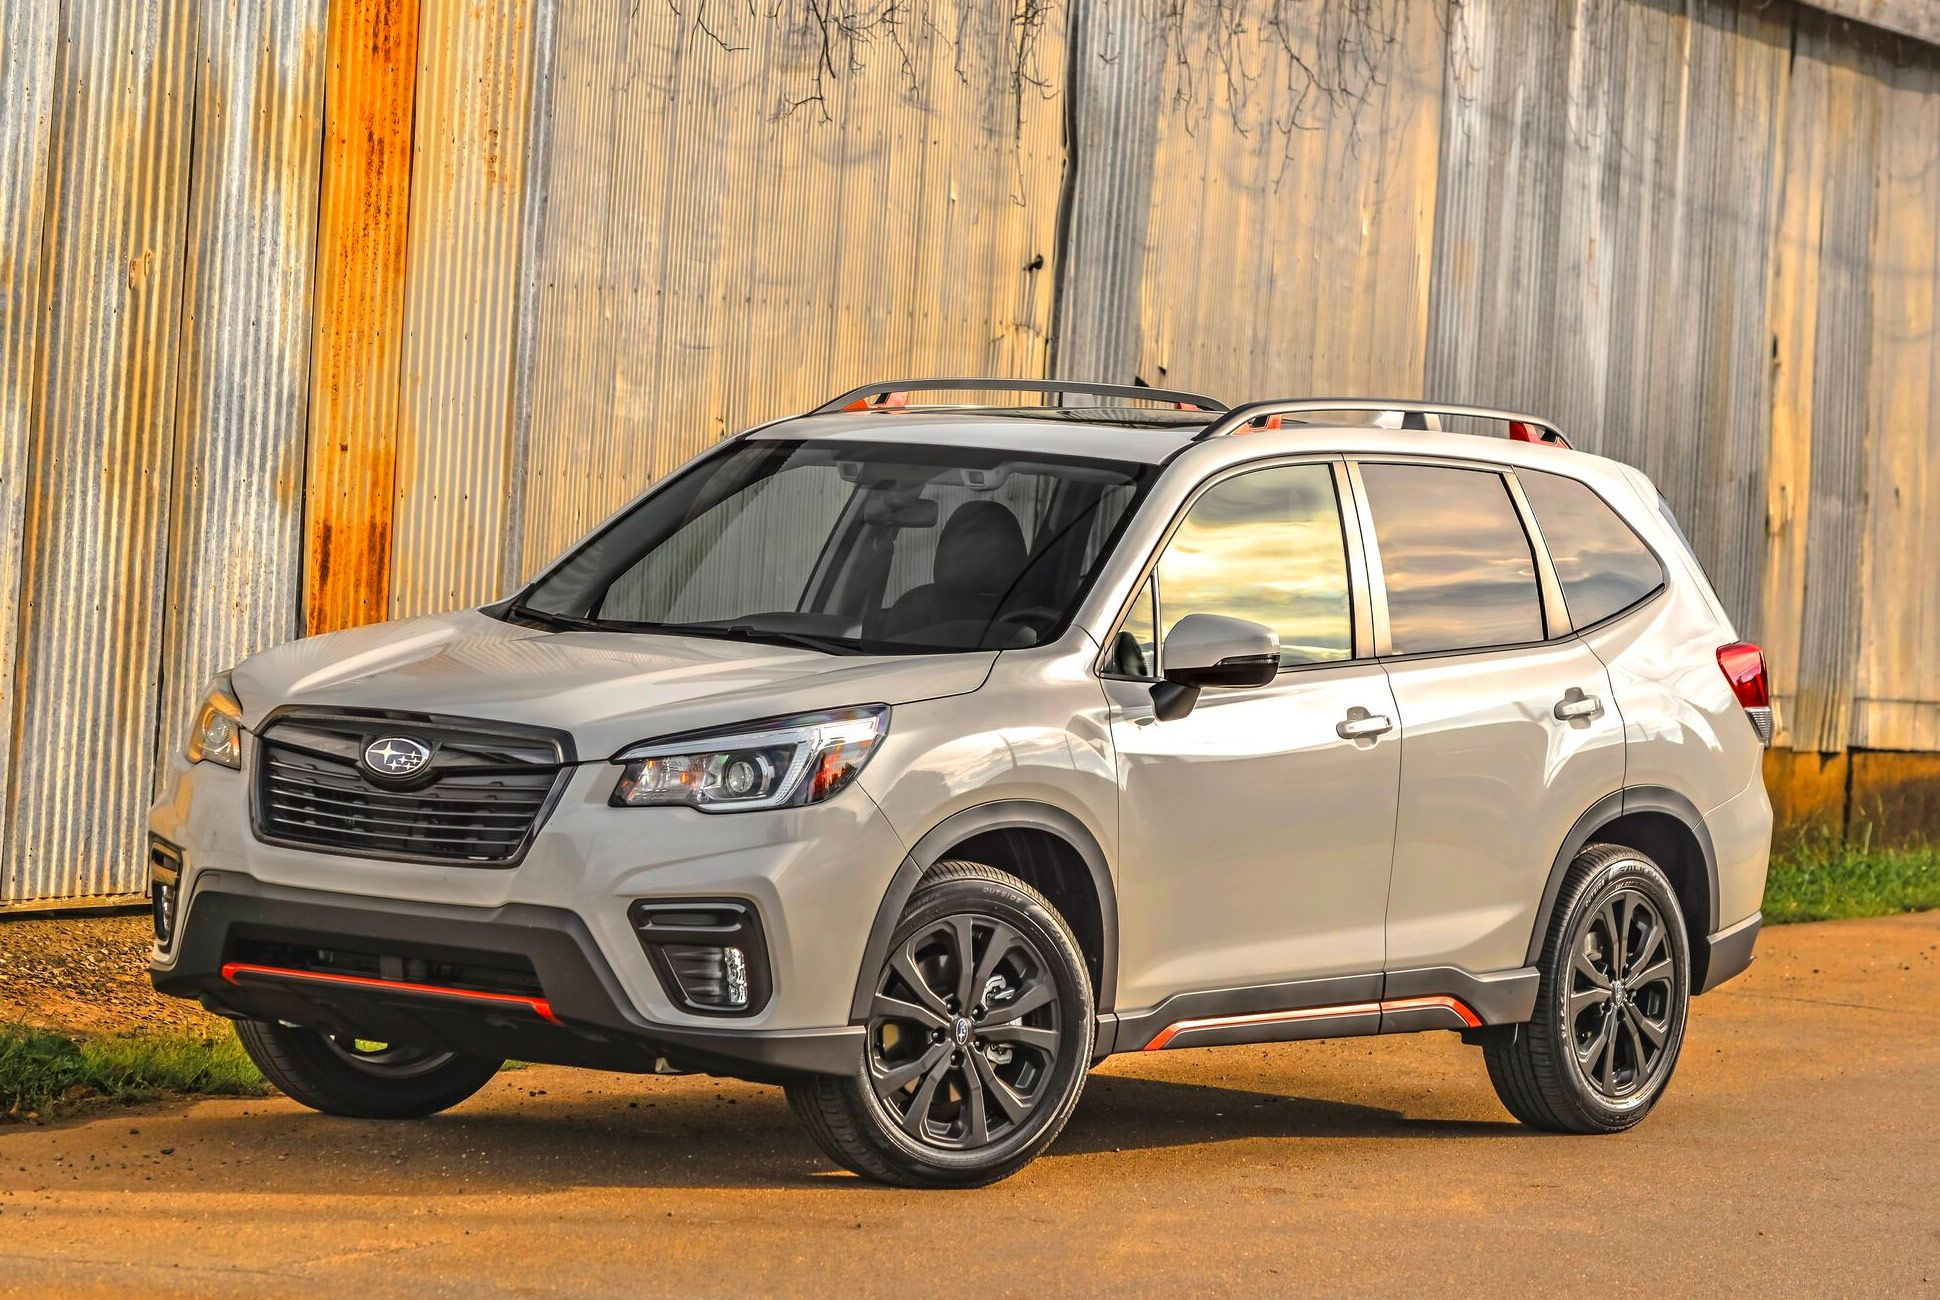 2019-Subaru-Forester-Gear-Patrol-Slide-1